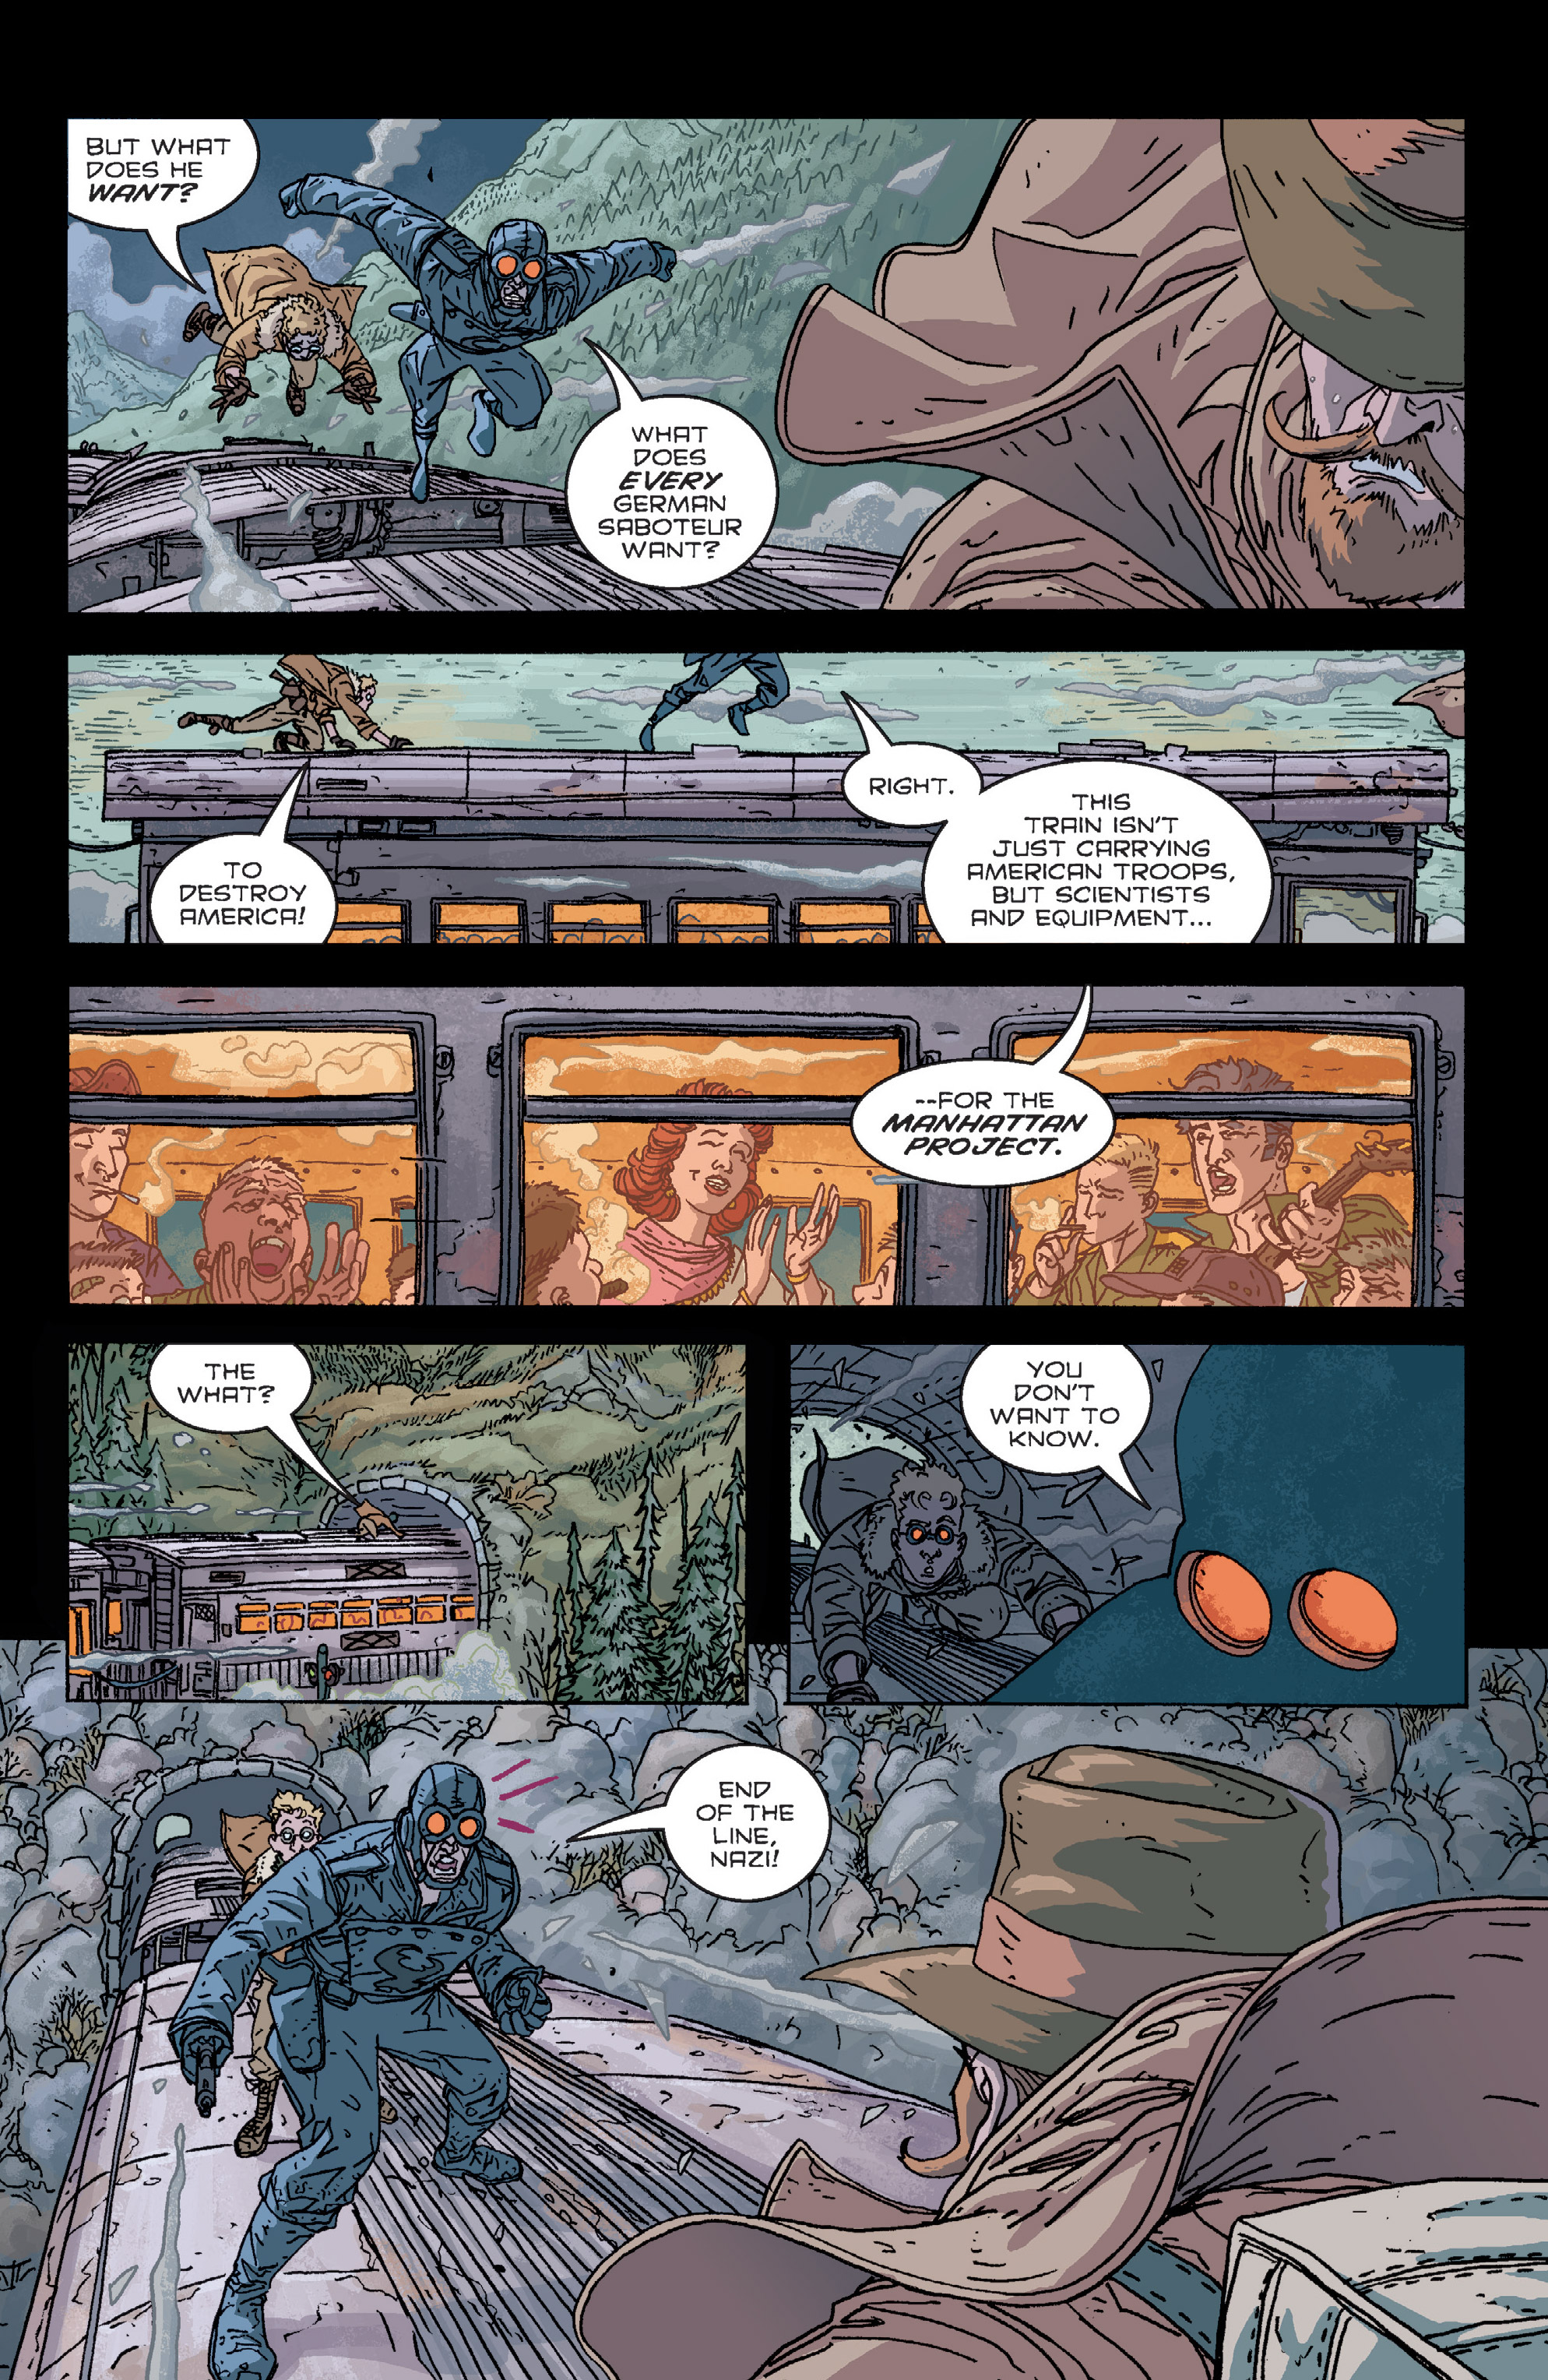 Read online B.P.R.D. (2003) comic -  Issue # TPB 2 - 61